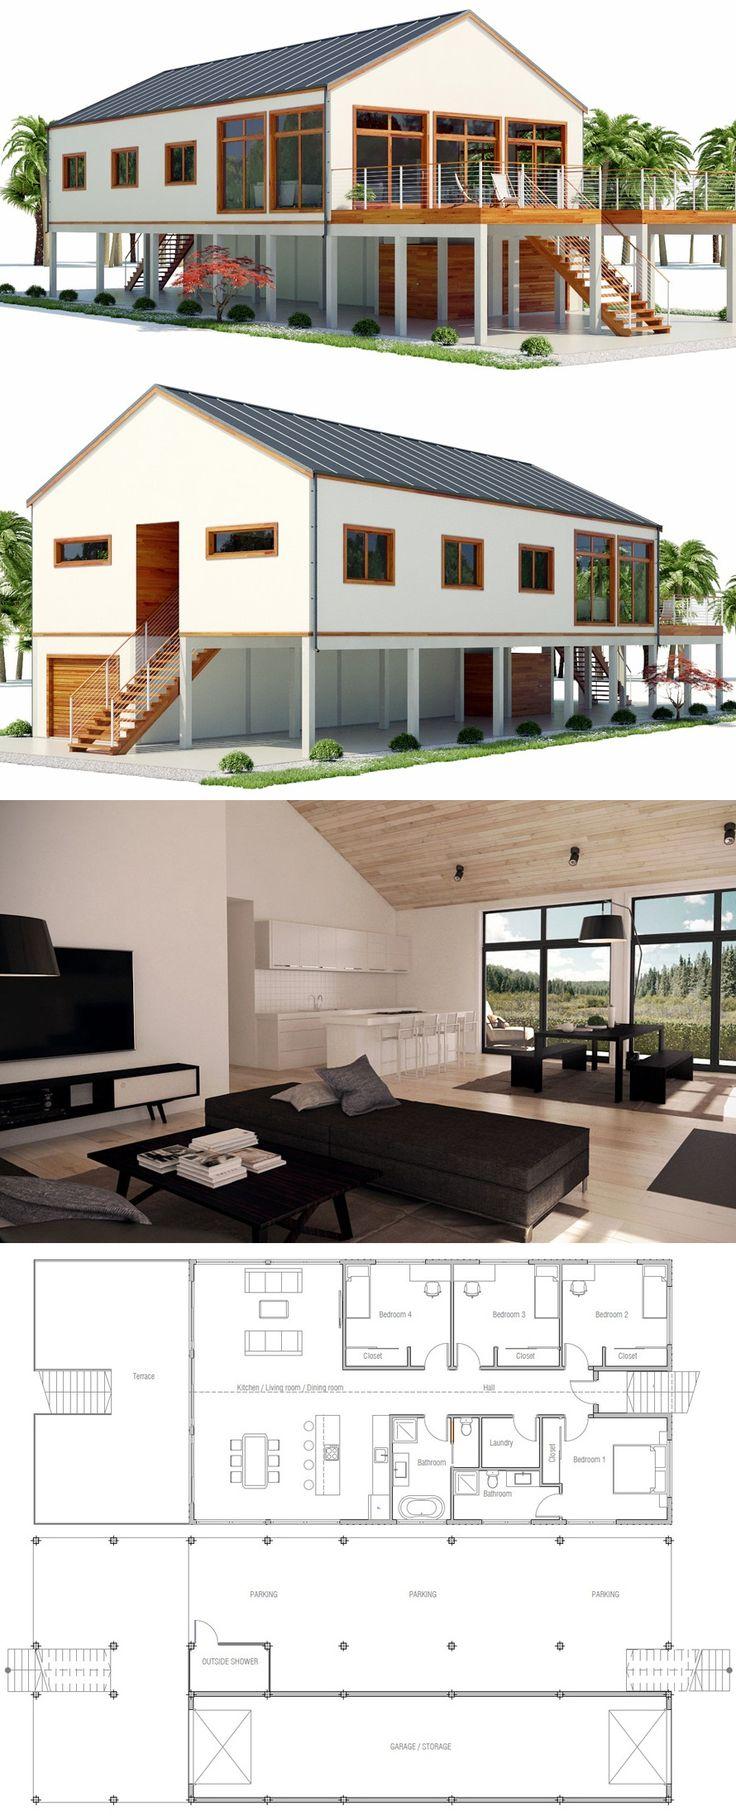 Beach house plan 9 best Raised coastal